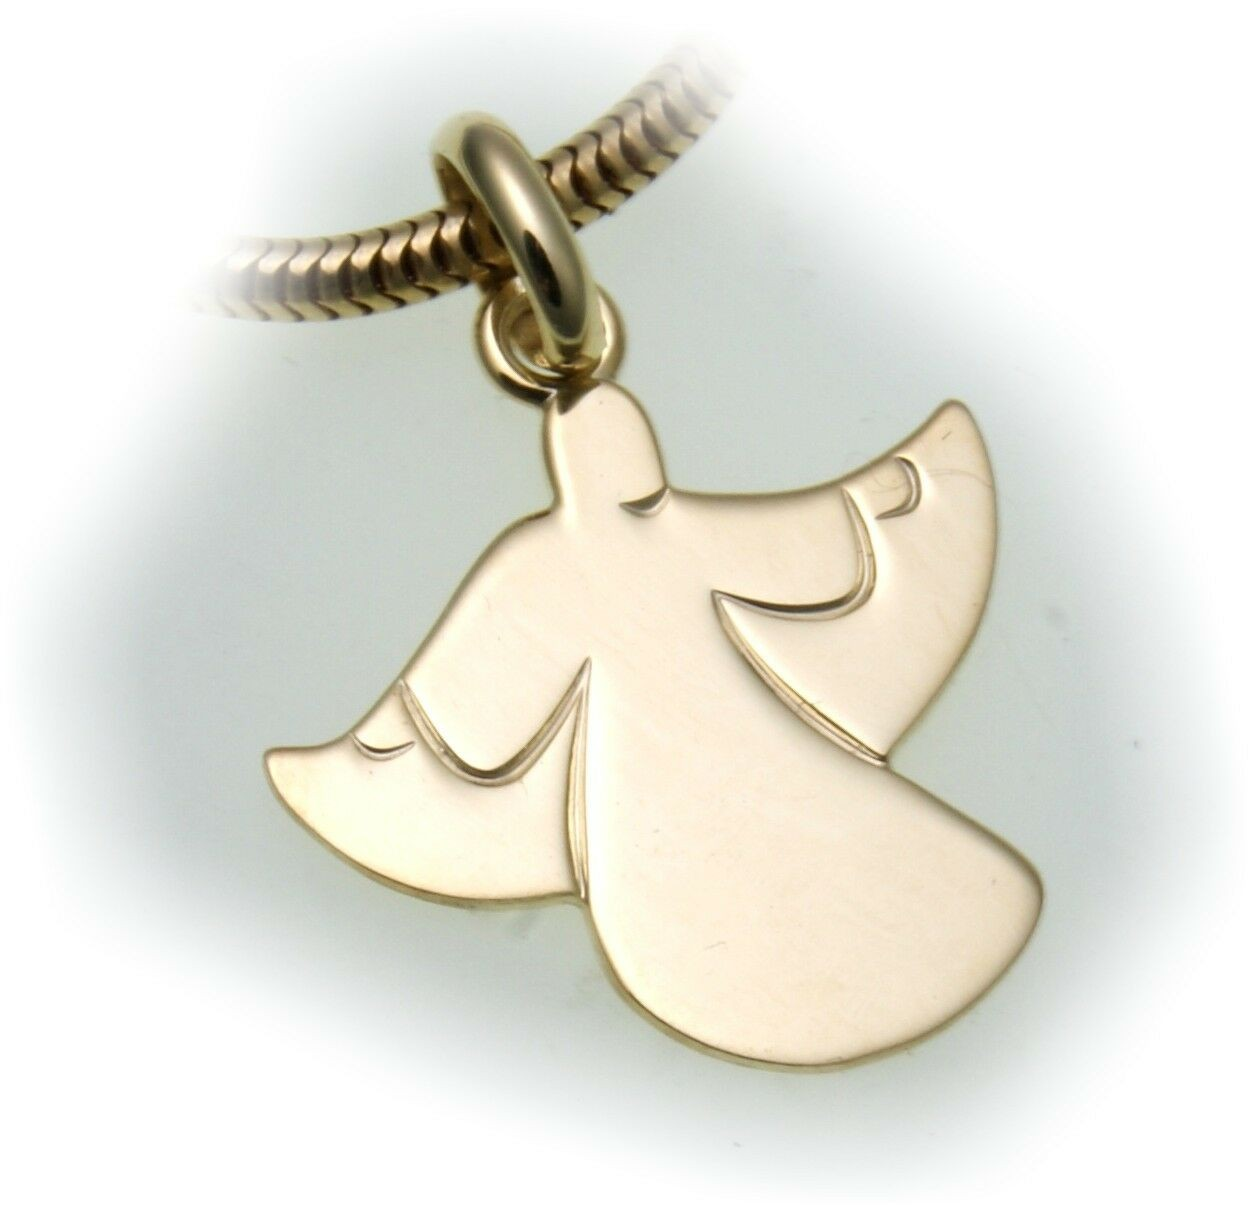 Neu Damen Anhänger Engel echt Gold 585 Gelbgold 14kt Schutzengel Gravur möglich